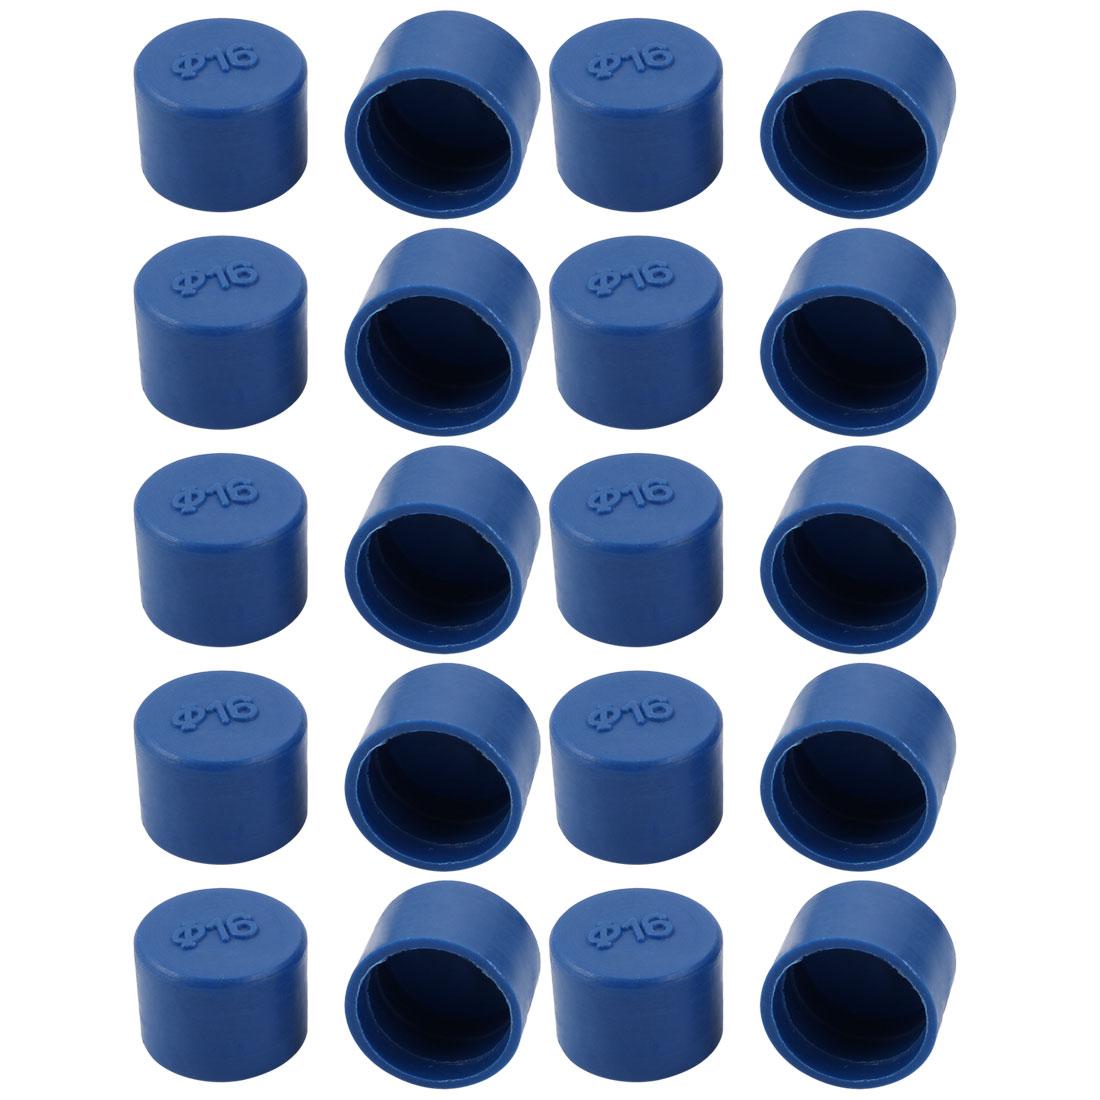 20pcs 16mm Inner Dia PE Plastic End Cap Bolt Thread Protector Tube Cover Blue